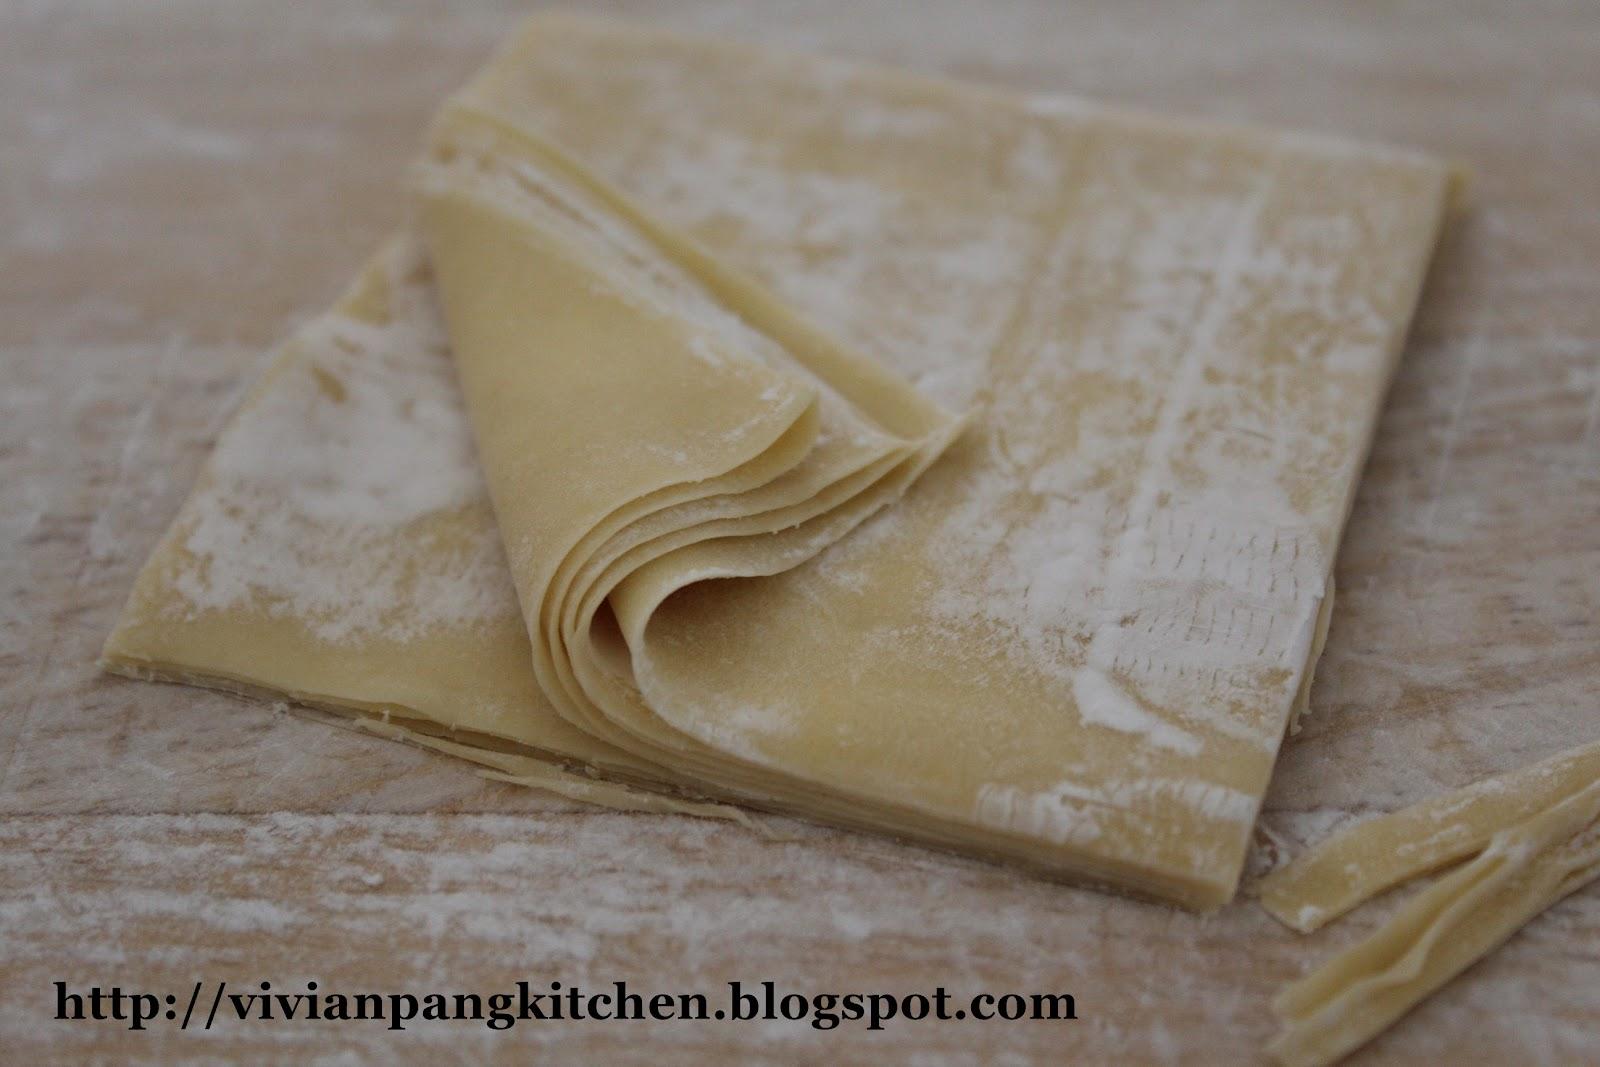 Vivian Pang Kitchen Homemade Wonton Wrapper With Egg 云吞皮